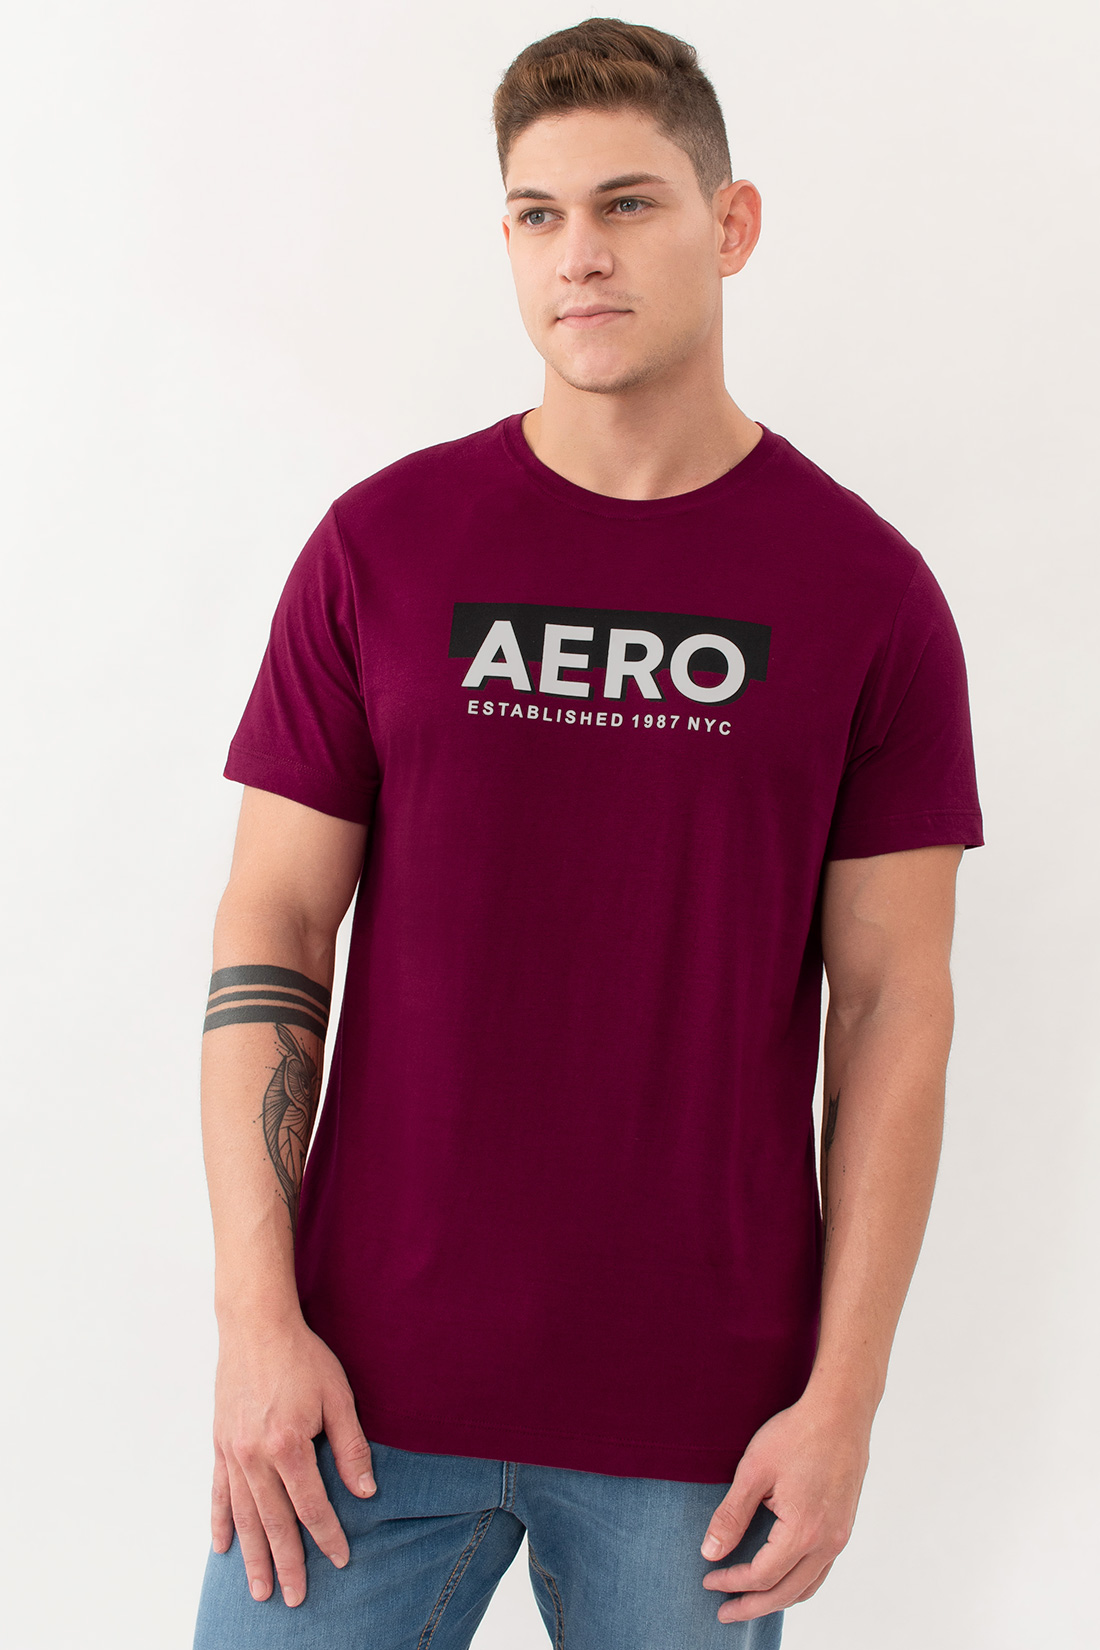 Camiseta Mc Aeropostale Established